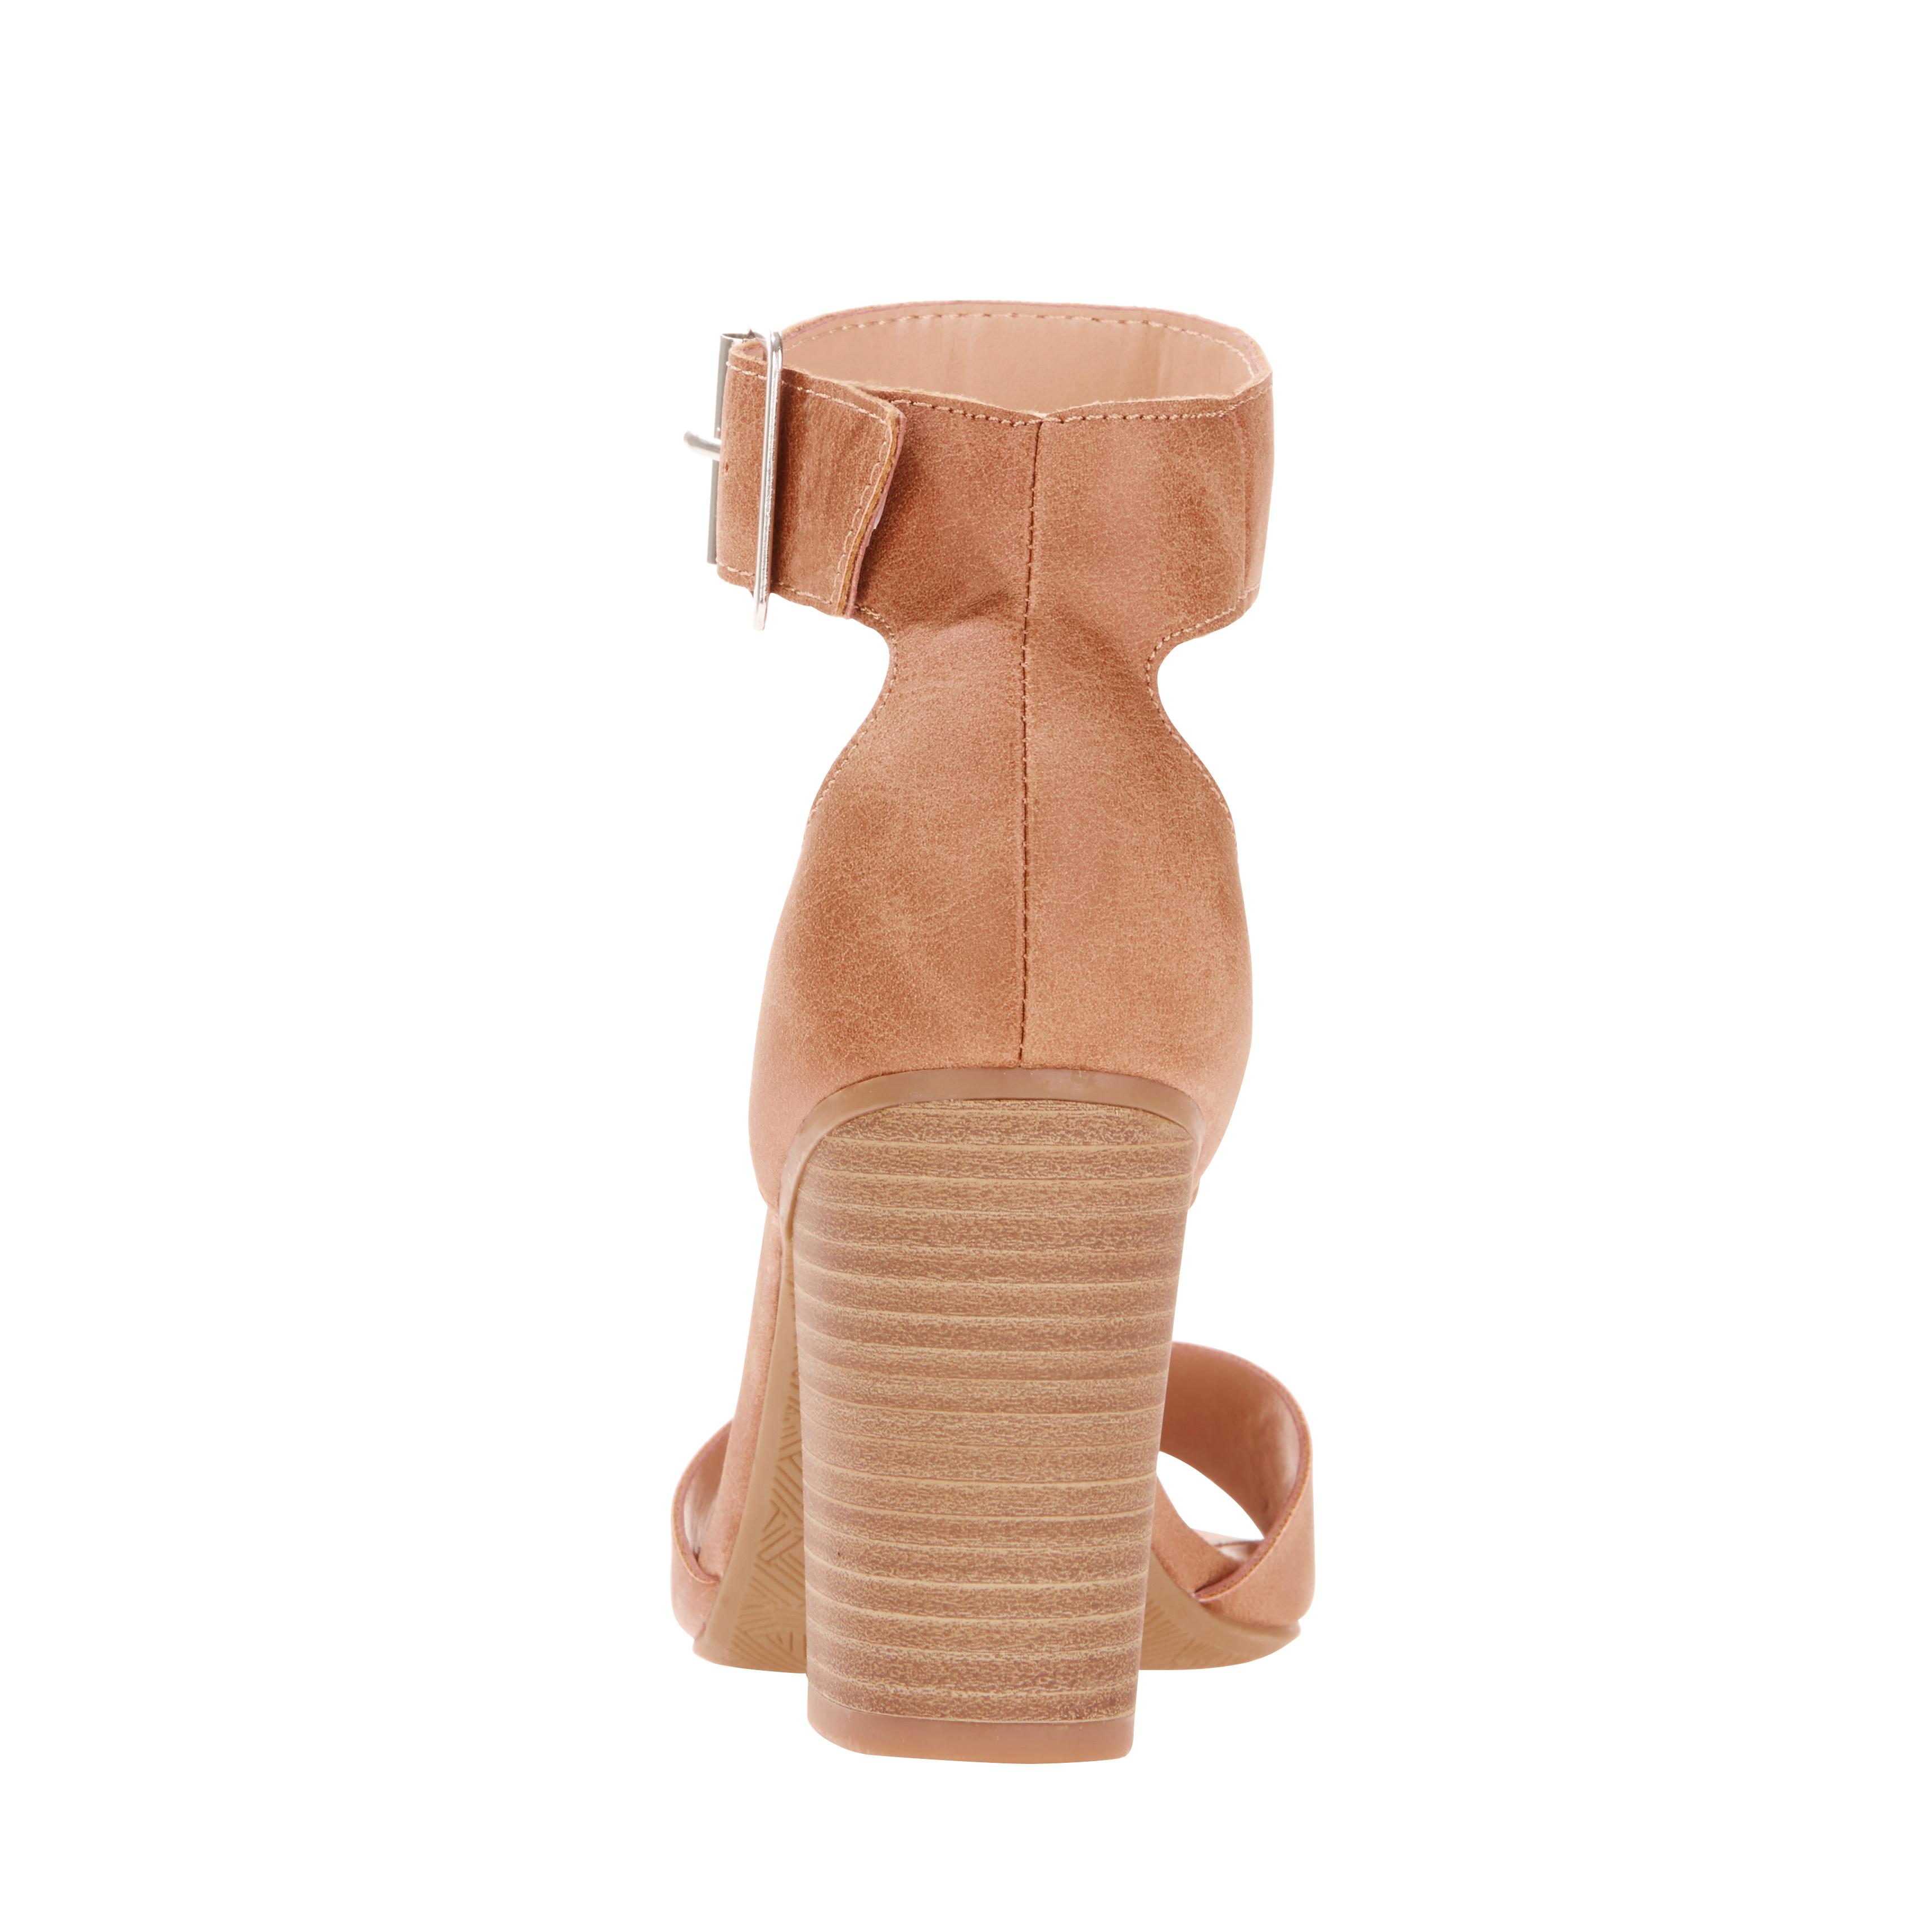 60ccba9e46d Big Buddha - Women s Ankle Strap Heel - Walmart.com